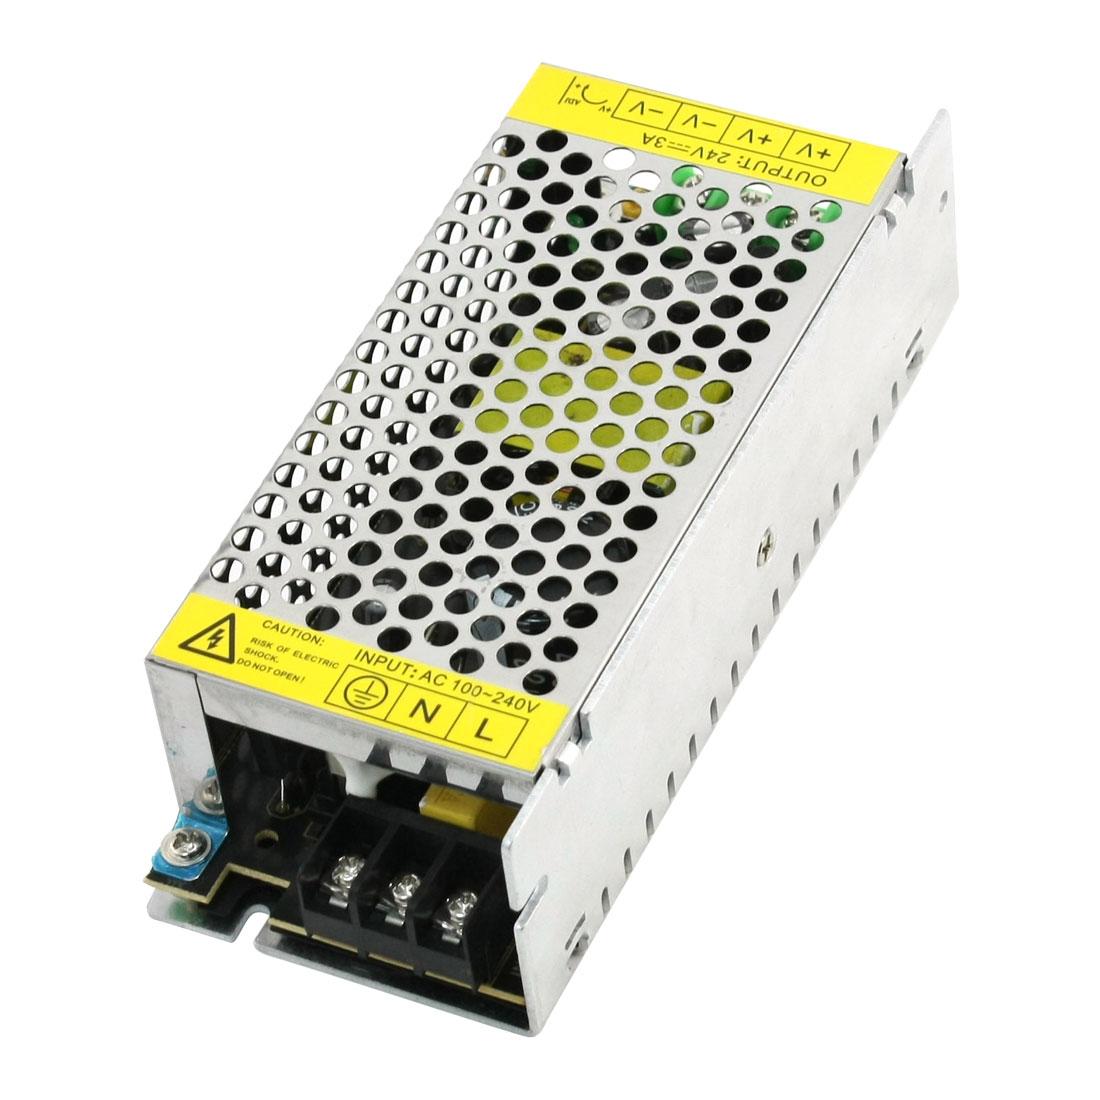 DC 24V 3A Switch Power Supply Converter for LED Illuminated AC 100-240V